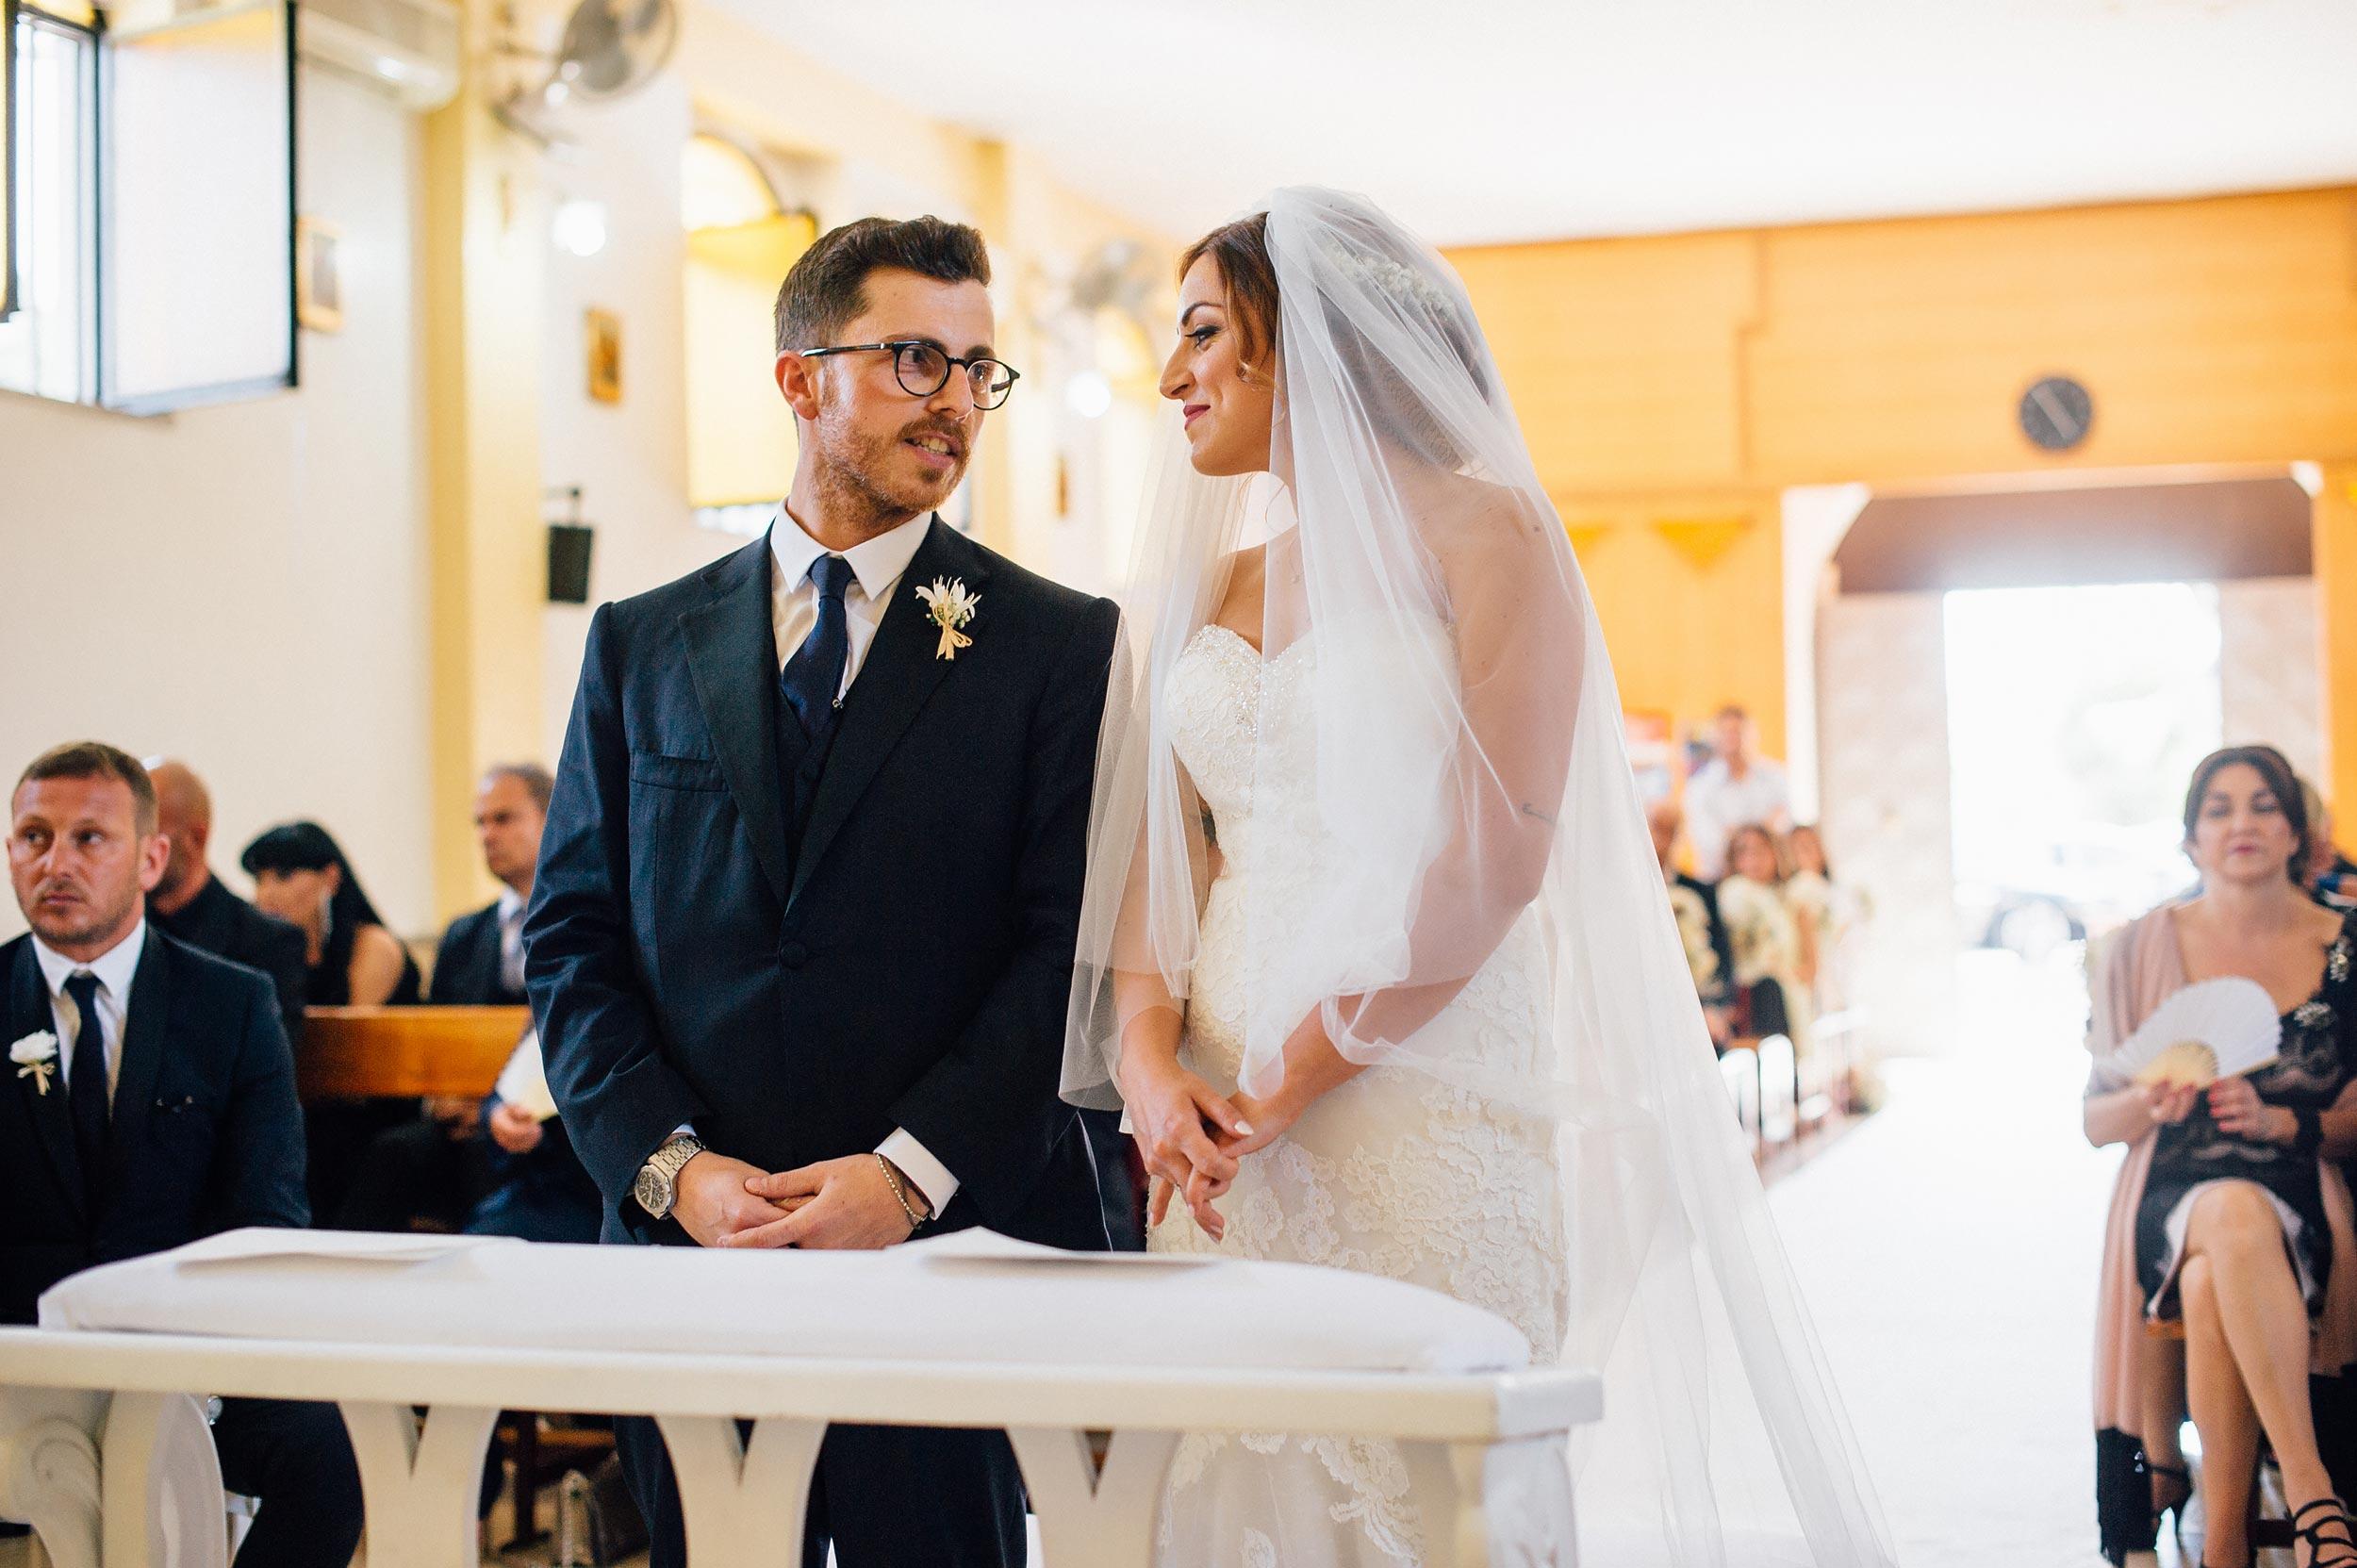 2016-Claudio-Teresa-Naples-Wedding-Photographer-Italy-Alessandro-Avenali-46.jpg